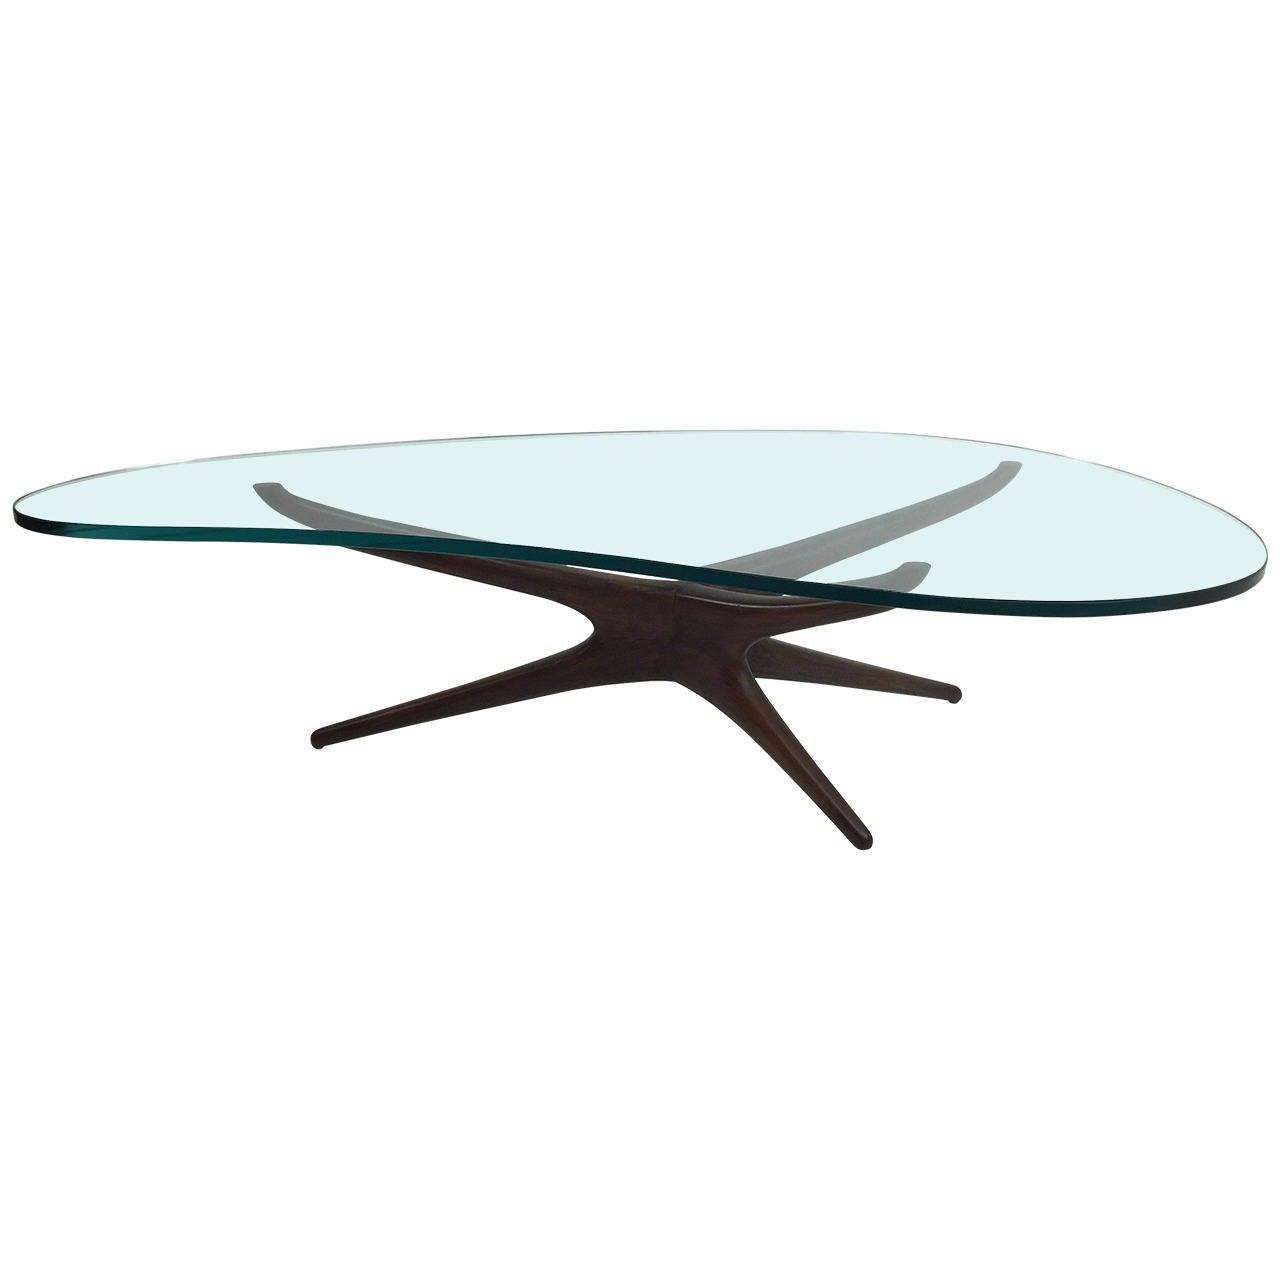 Vladimir Kagan Tri Symmetric Sculptured Coffee Table At 1stdibs